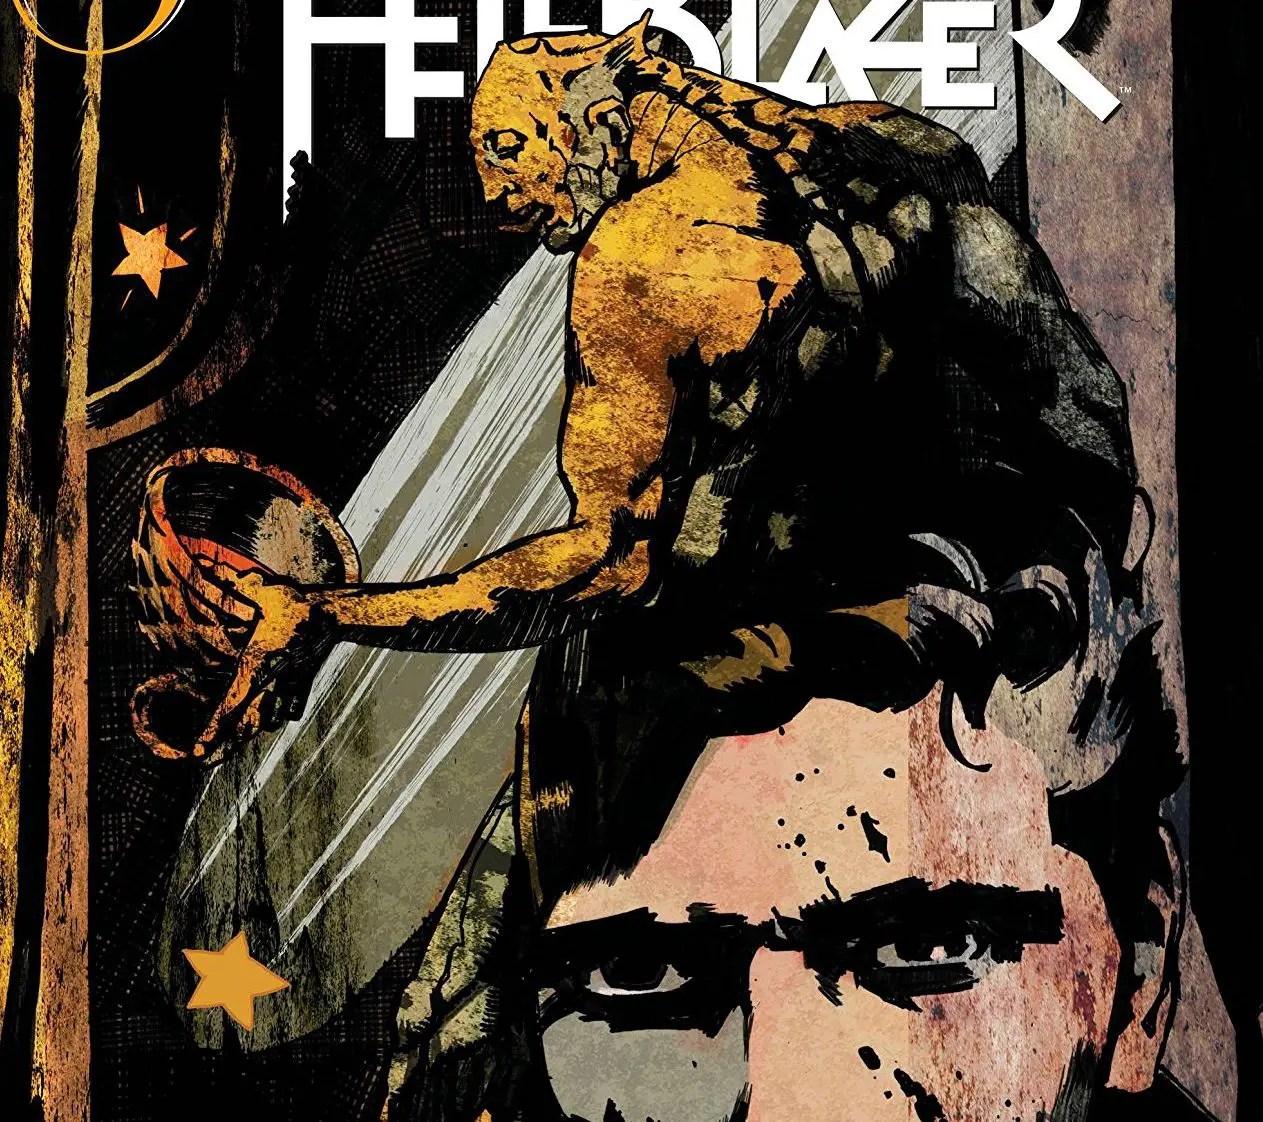 John Constantine: Hellblazer #2 Review